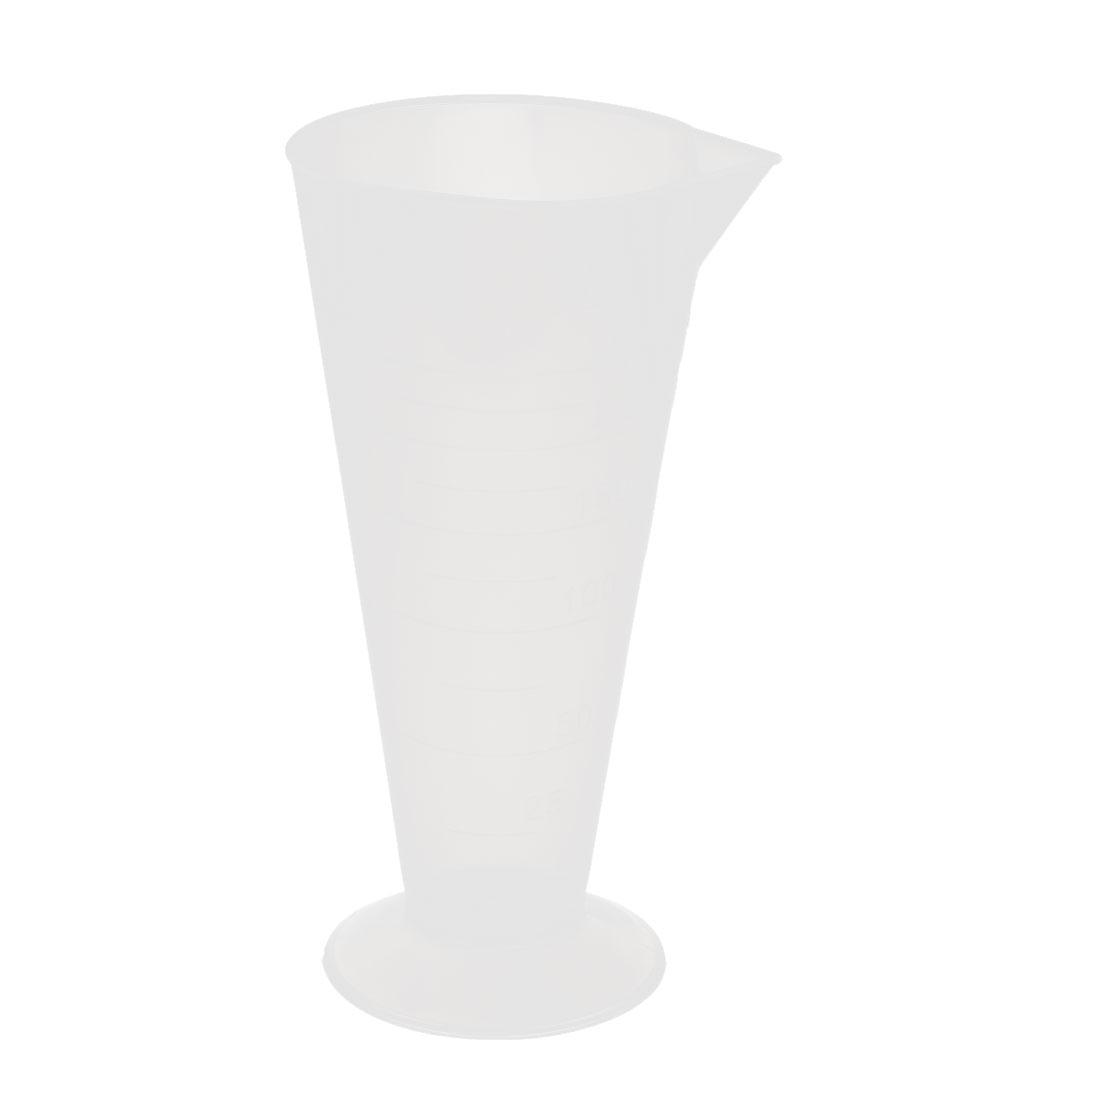 25ml-250ml Laboratory Using Water Liquid Testing Beaker Measuring Cup Thicken